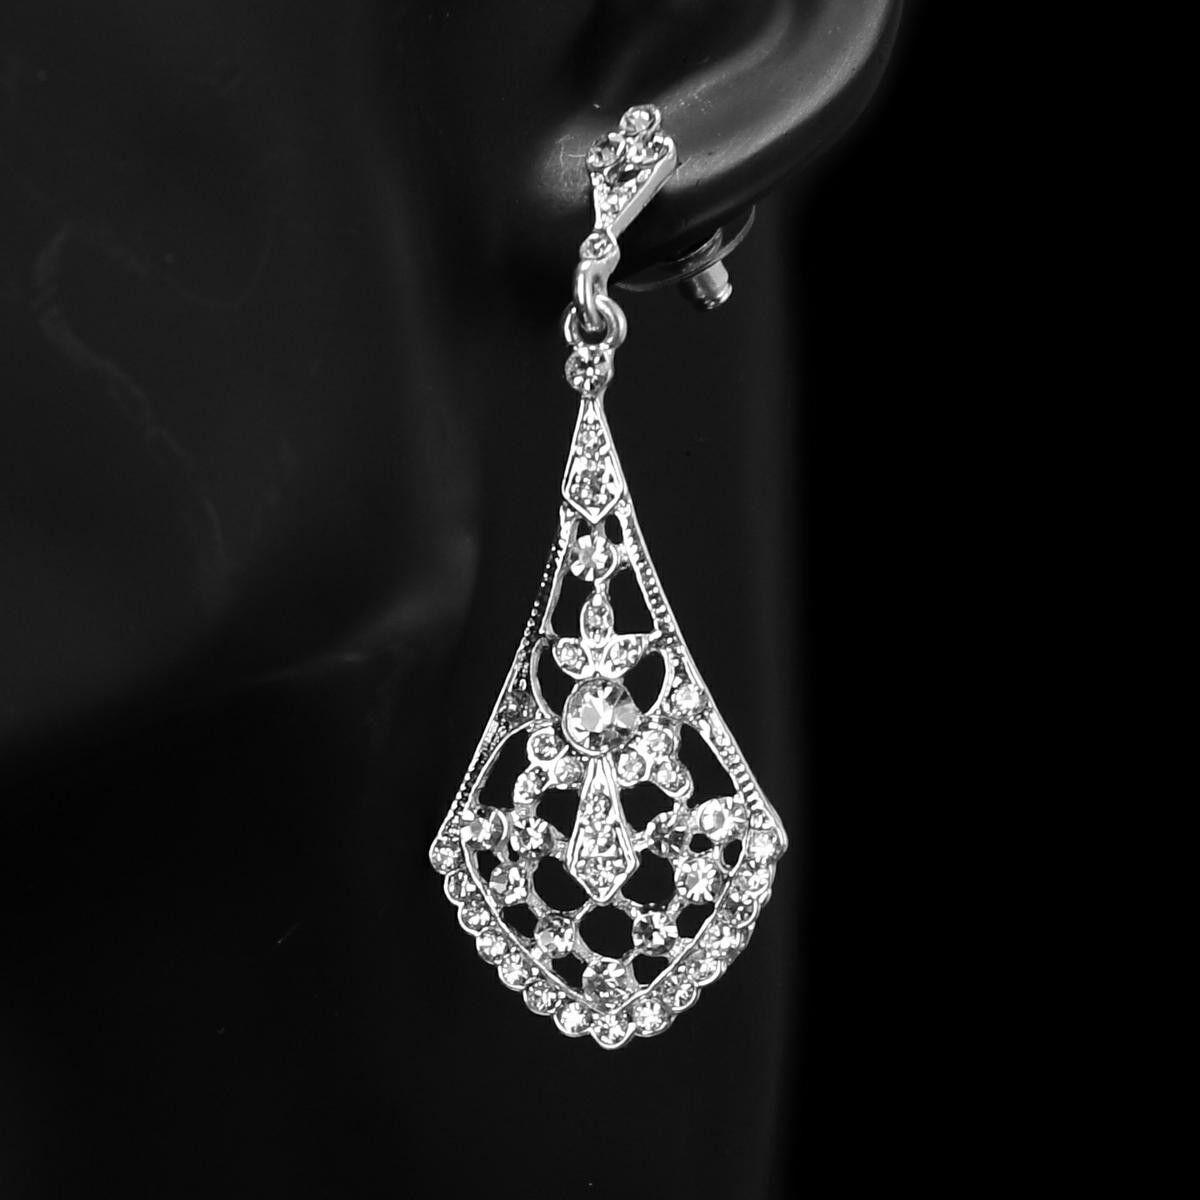 Swarovski Rhinestone Element Silver Tear Drop With Floral Design Bridal Earrings